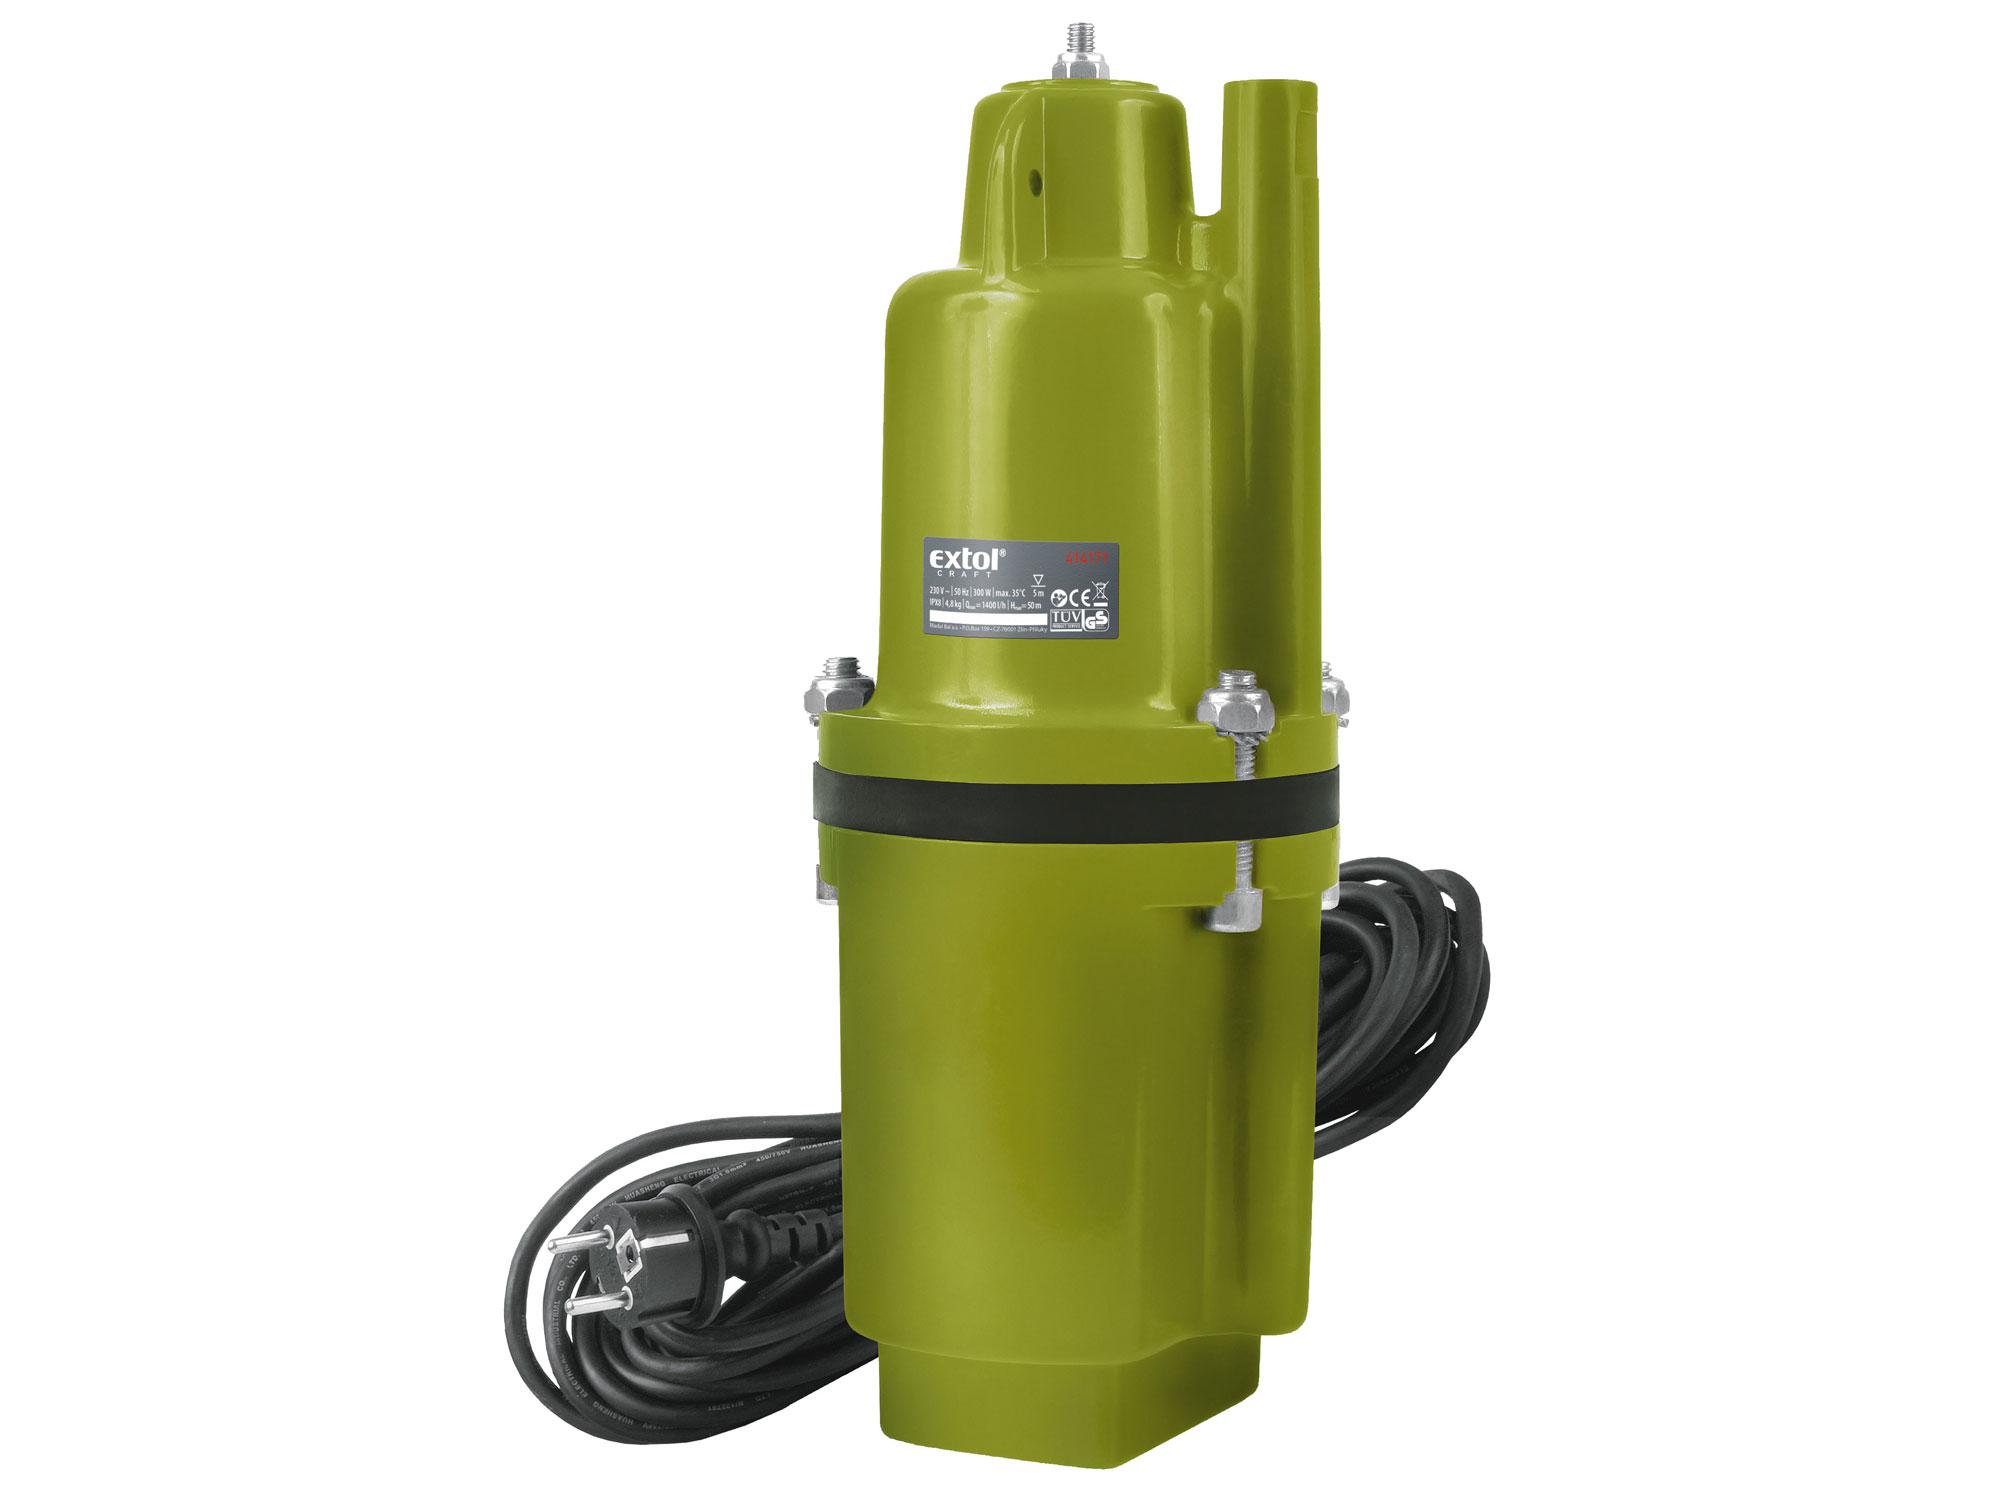 Čerpadlo membránové hlubinné ponorné EXTOL CRAFT 414172